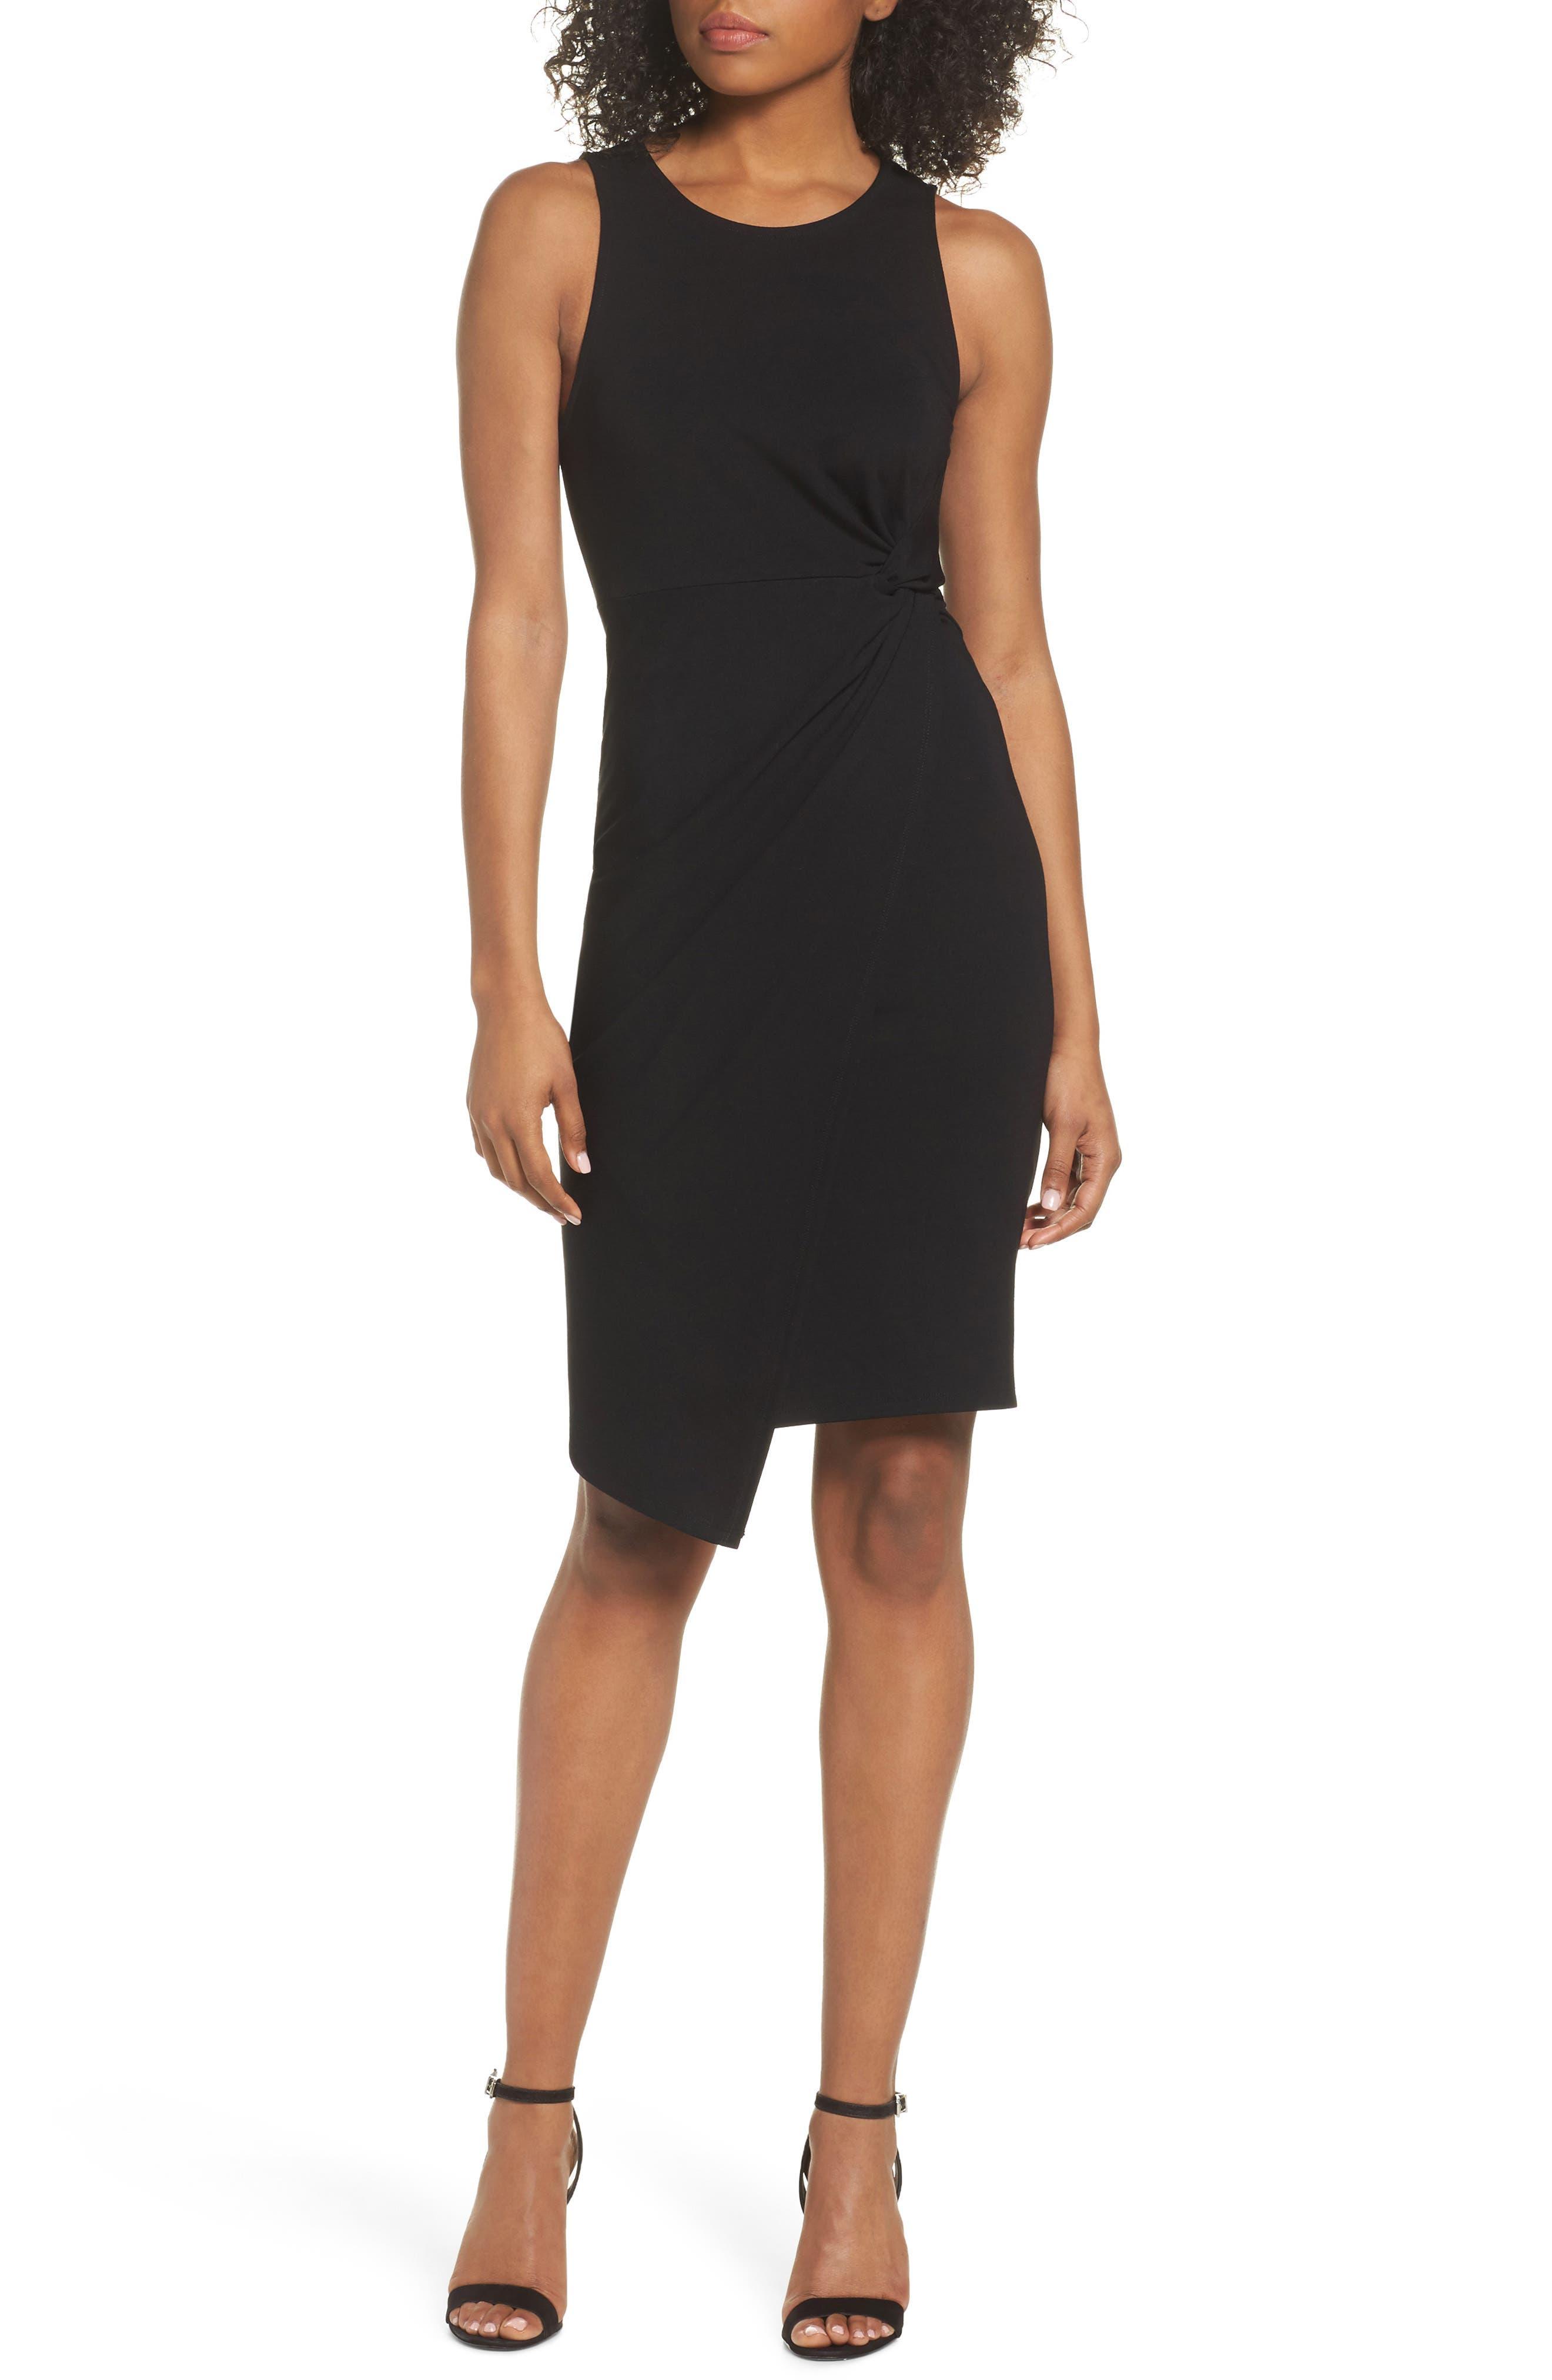 19 Cooper Asymmetric Hem Sheath Dress